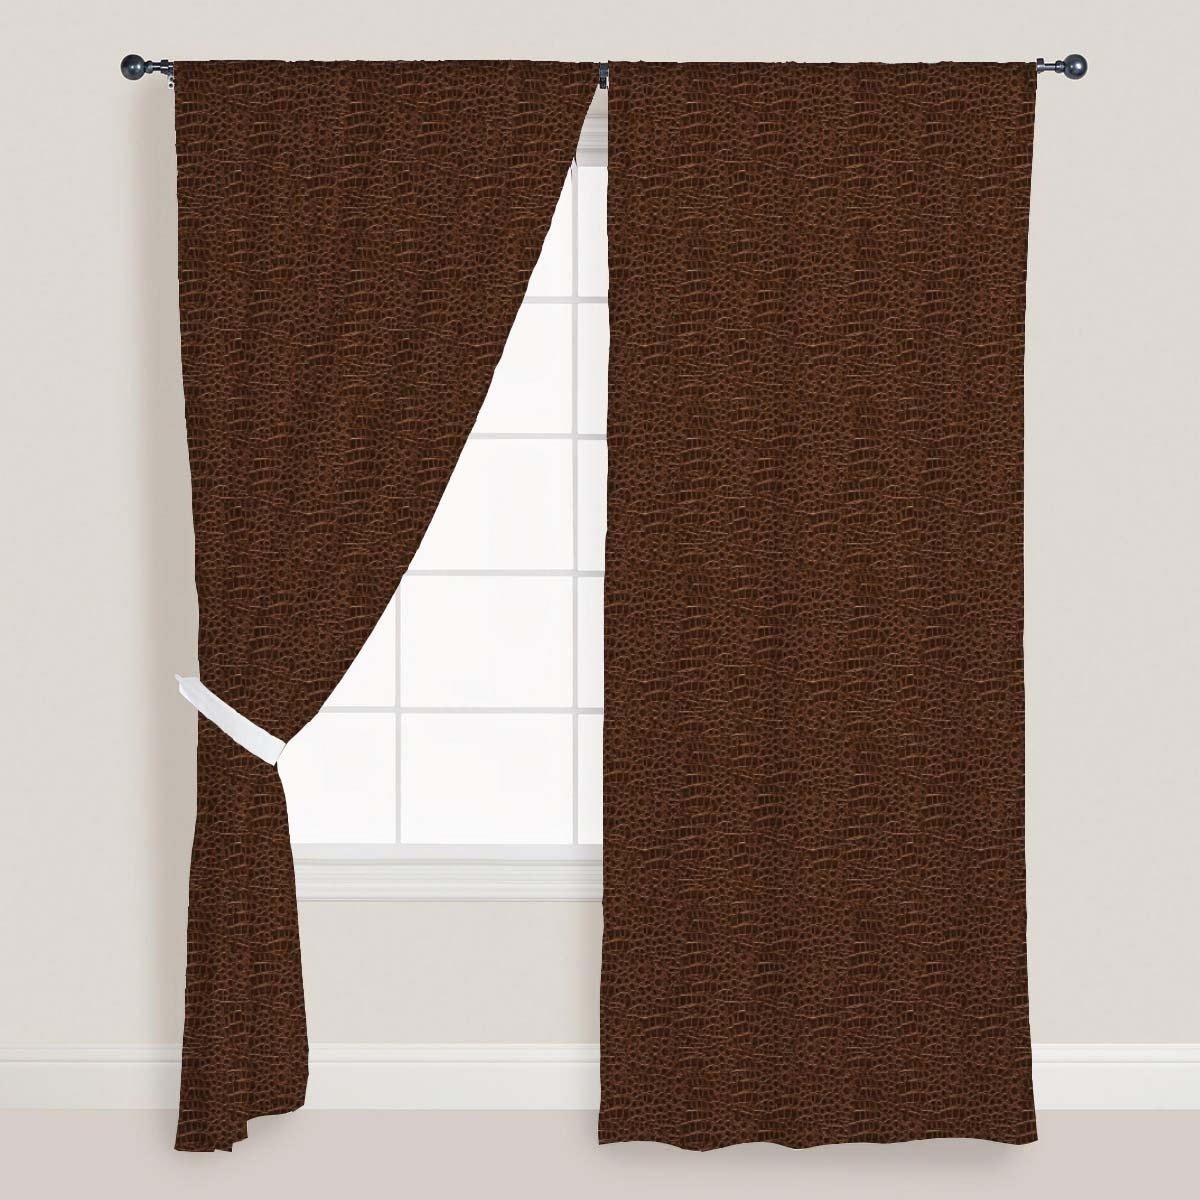 AZ Crocodile Hide Door & Window Curtain Satin 4feet x 11feet; SET OF 3 PCS